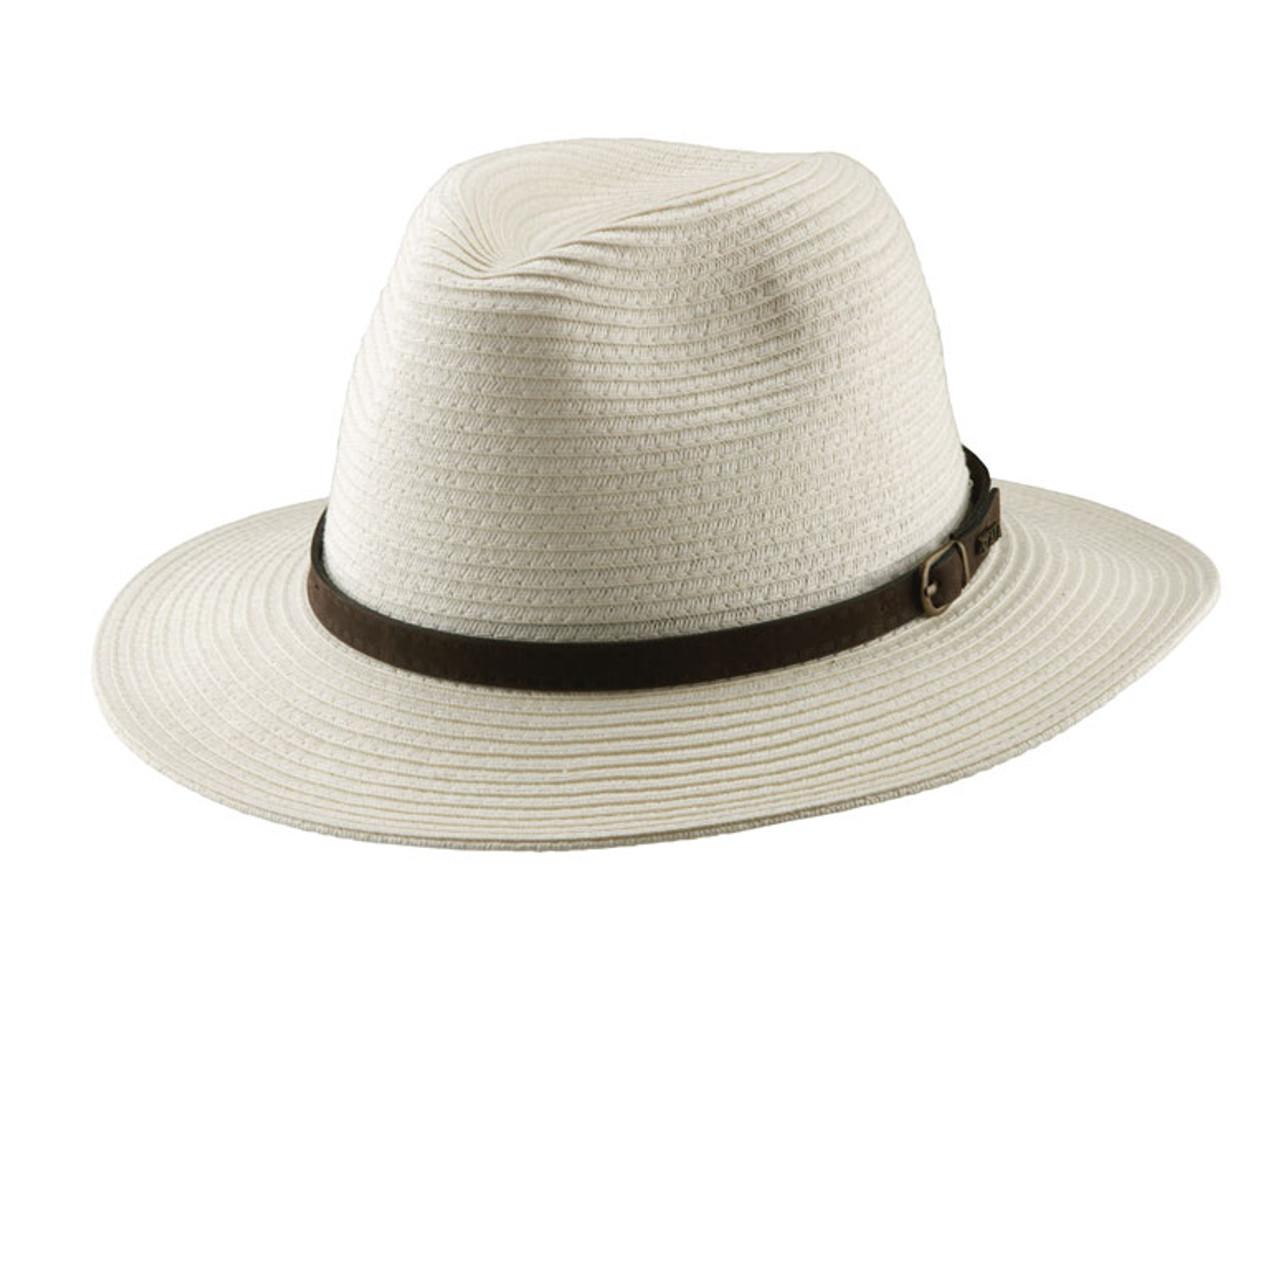 5c2d5d19 Scala   Ivory Toyo Safari Hat   Hats Unlimited